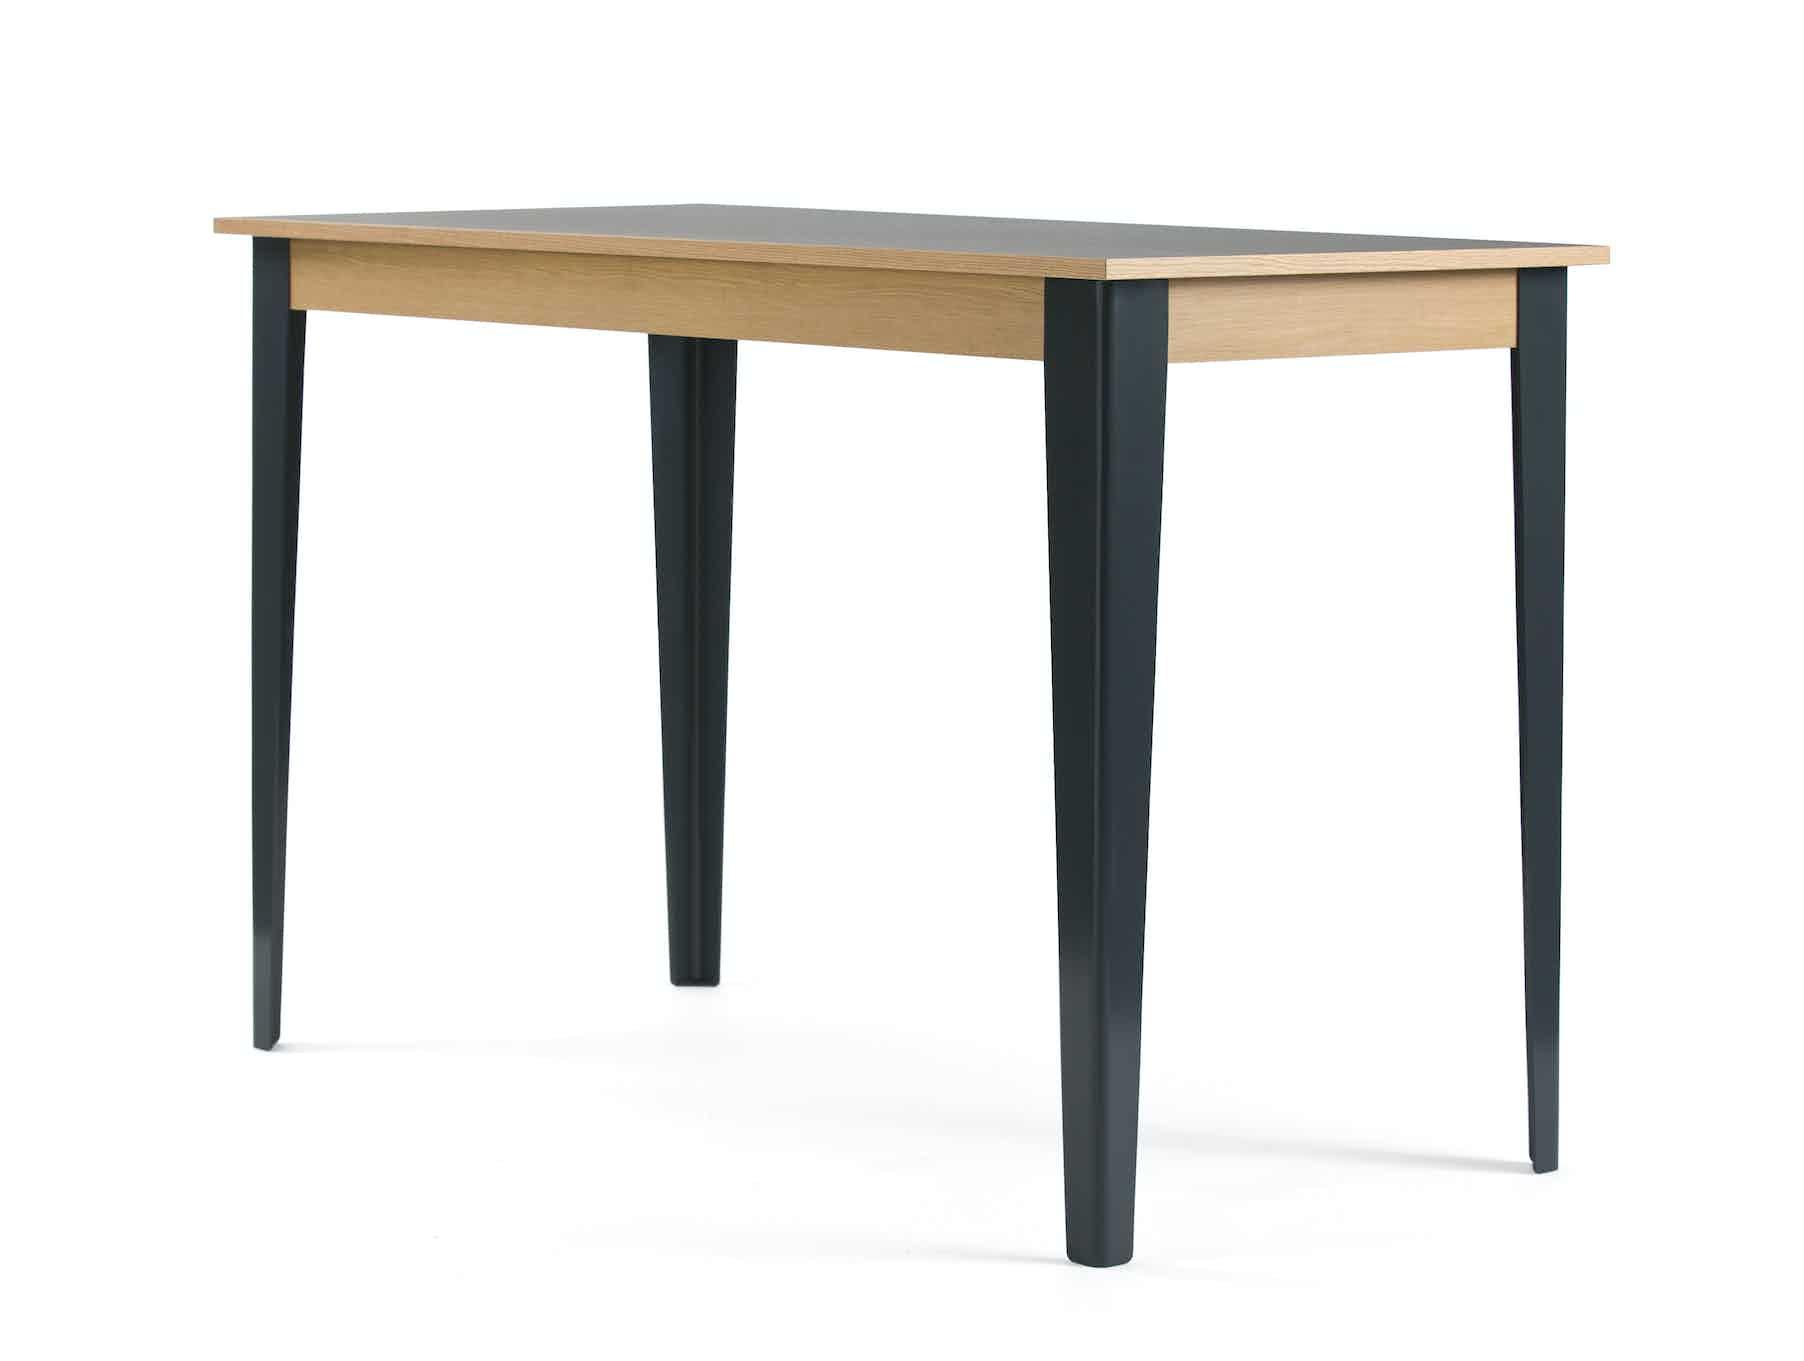 Deadgood-tree-table-tall-angle-haute-living